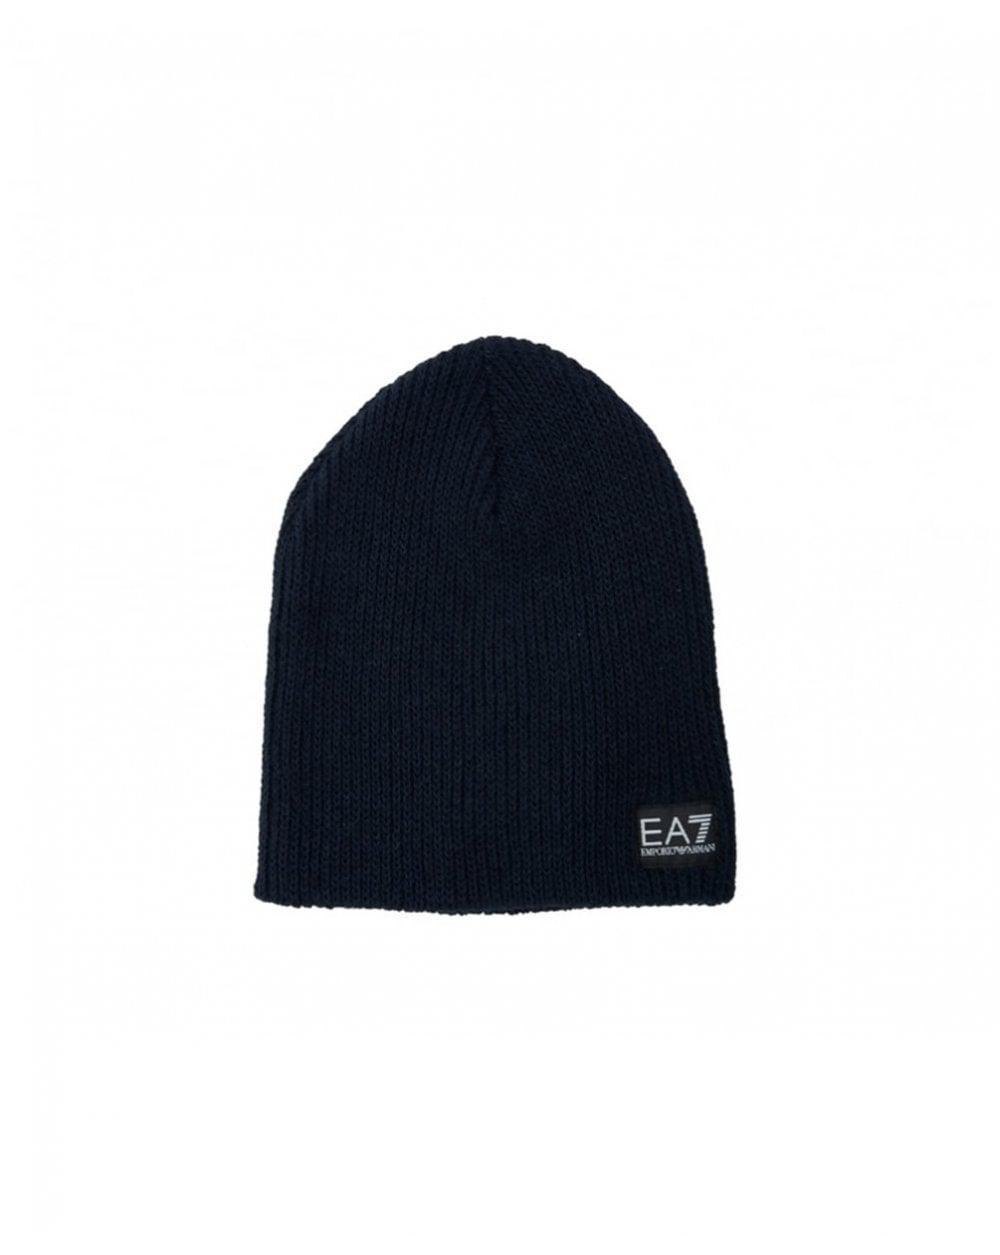 Ea7 Train Lux Beanie Hat in Blue for Men - Lyst 37bd141b30a7